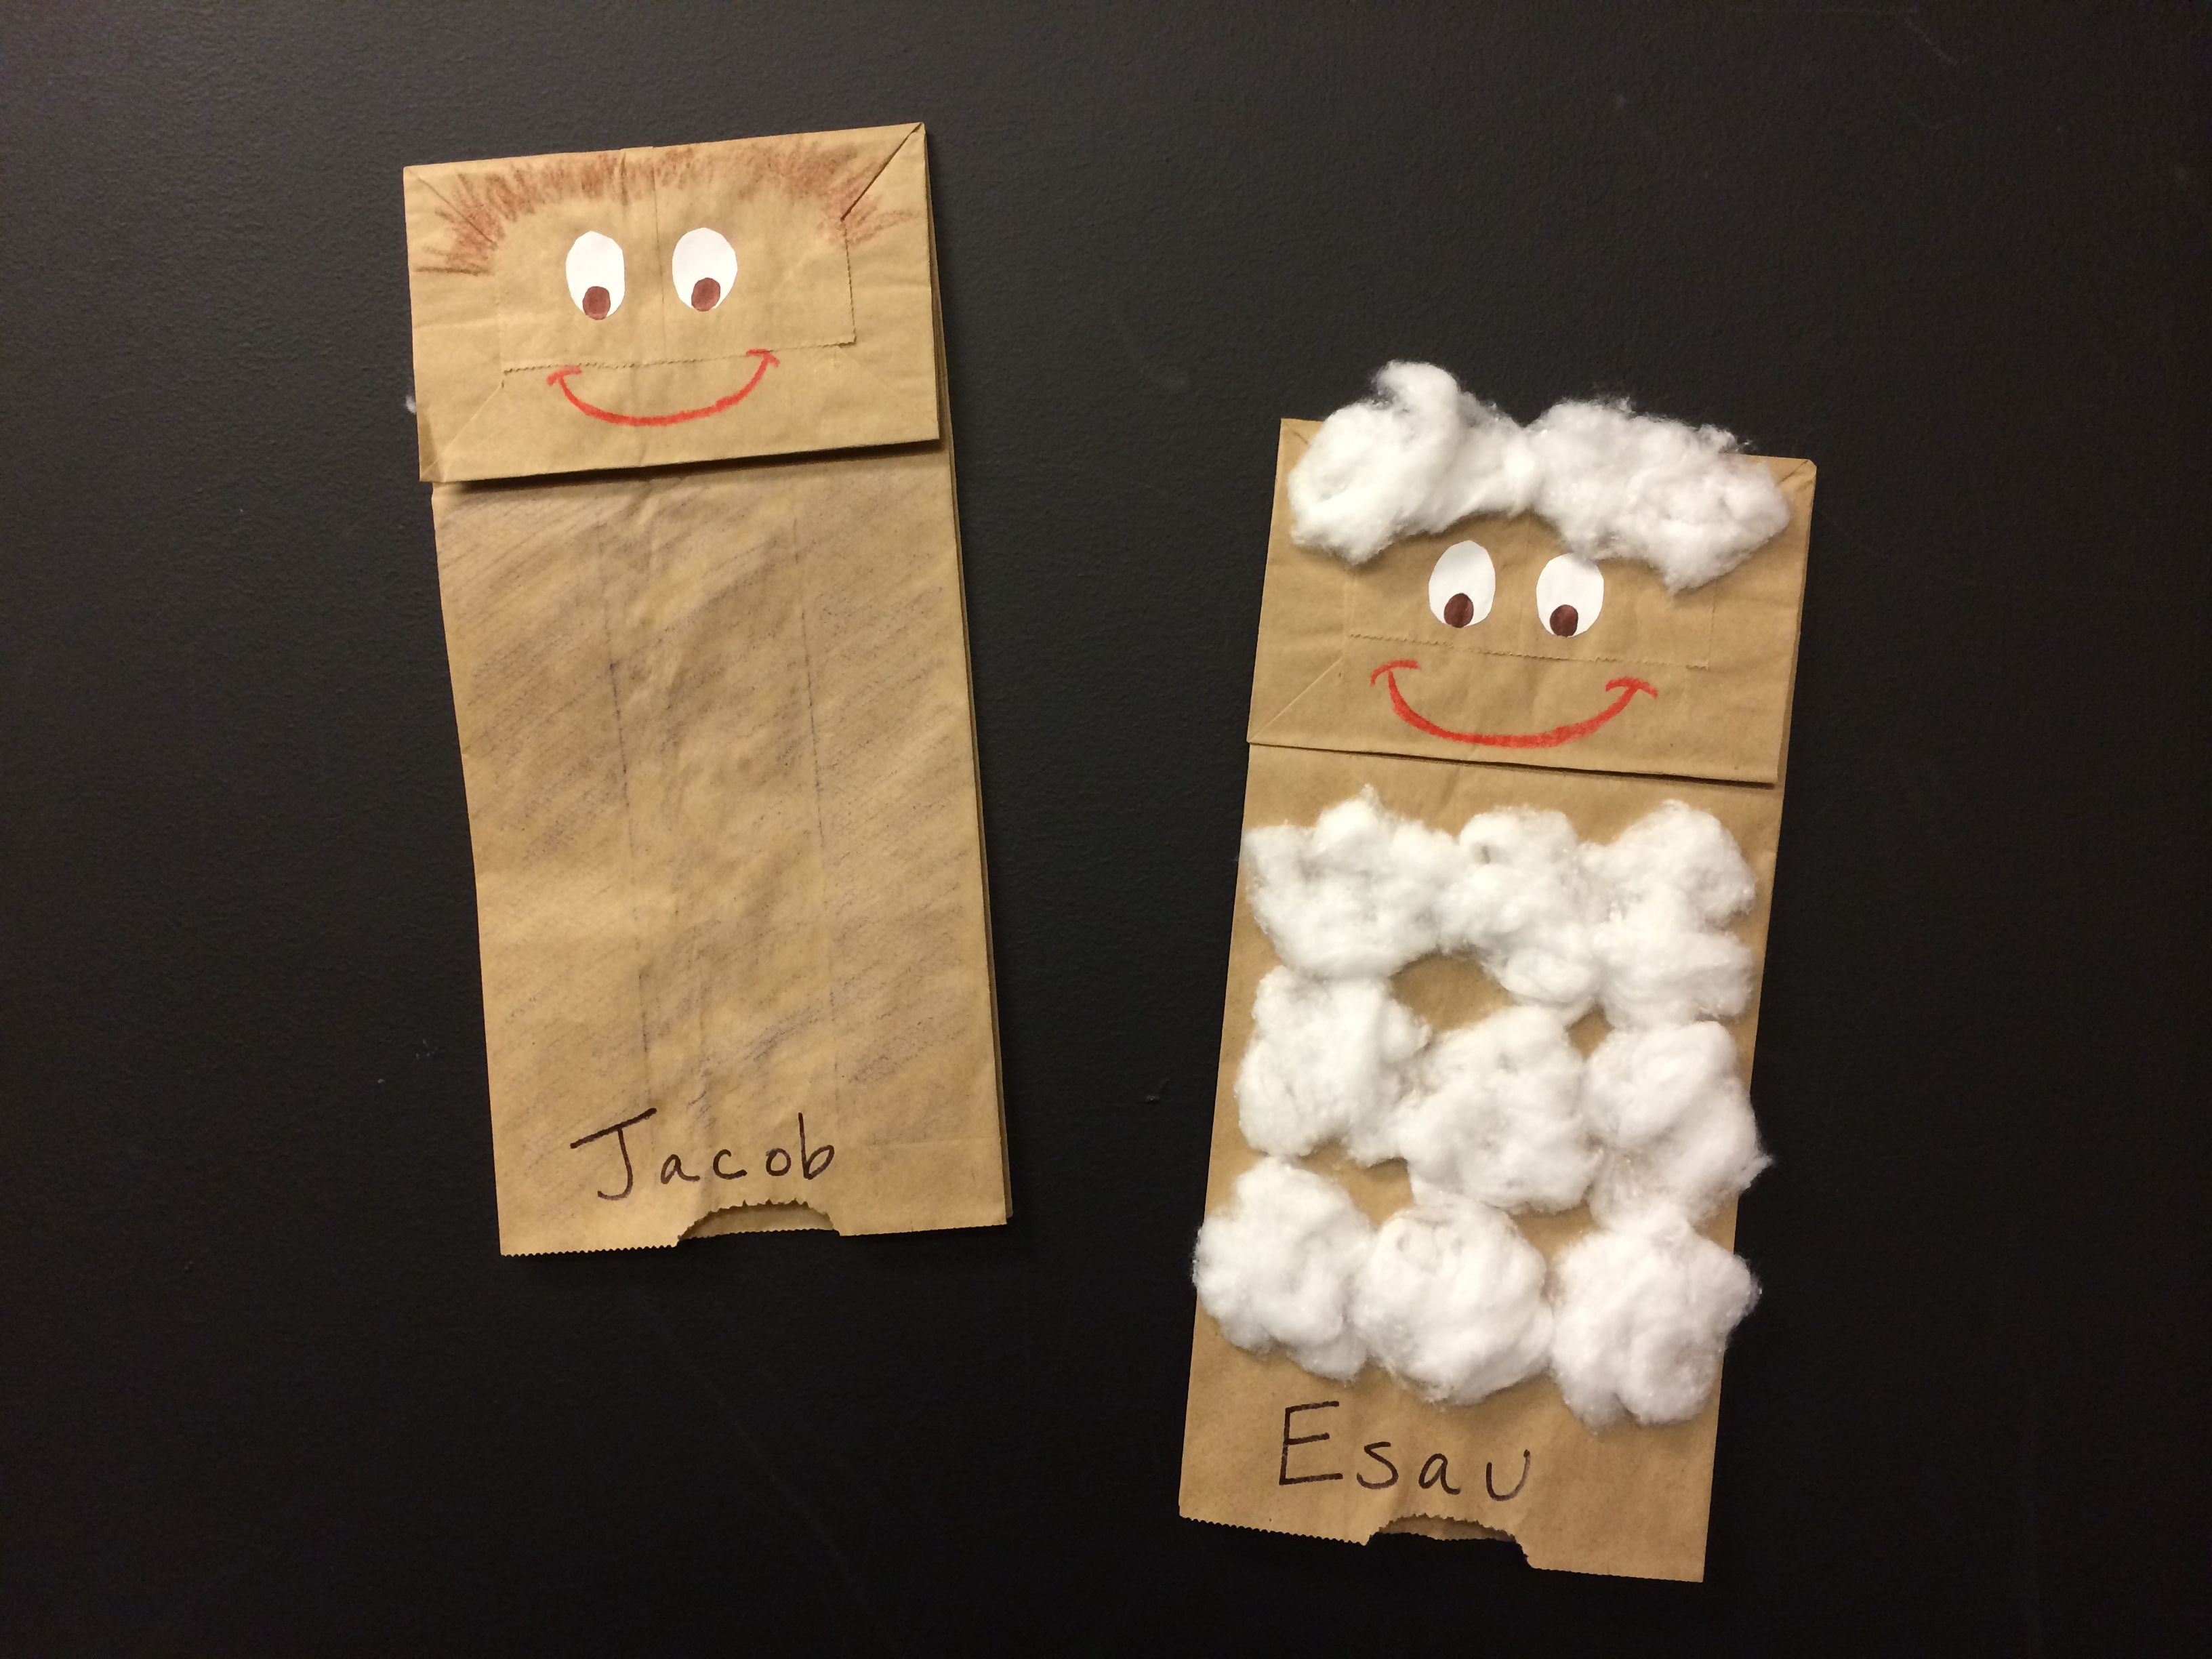 Jacob And Esau Puppets